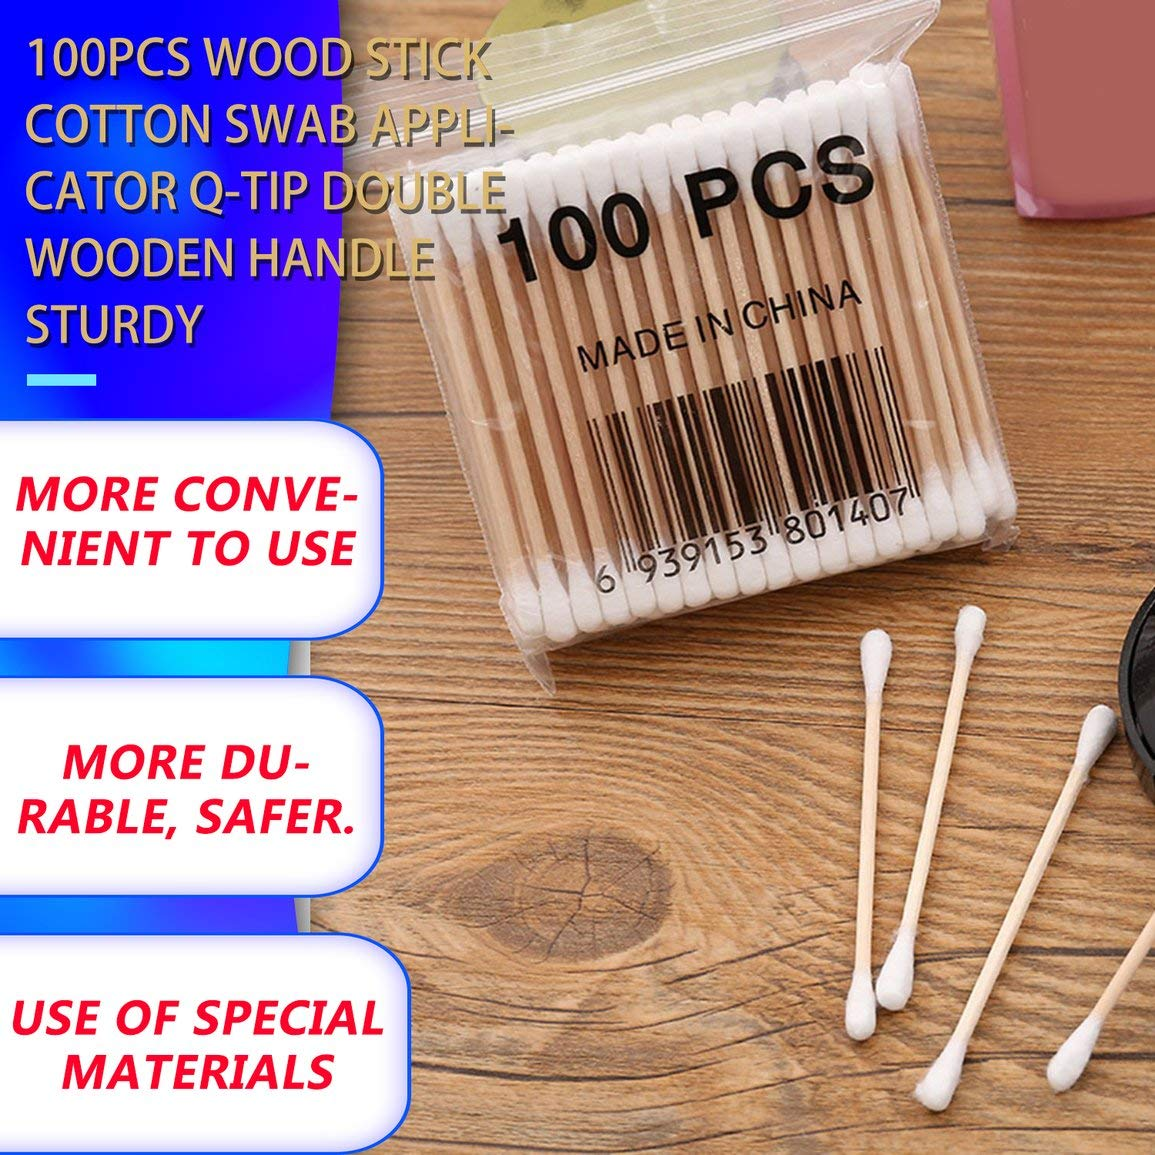 100 st/ücke Holz Stick Wattest/äbchen Applikator Q-tip Doppel Holzgriff Robust Farbe: Wei/ß